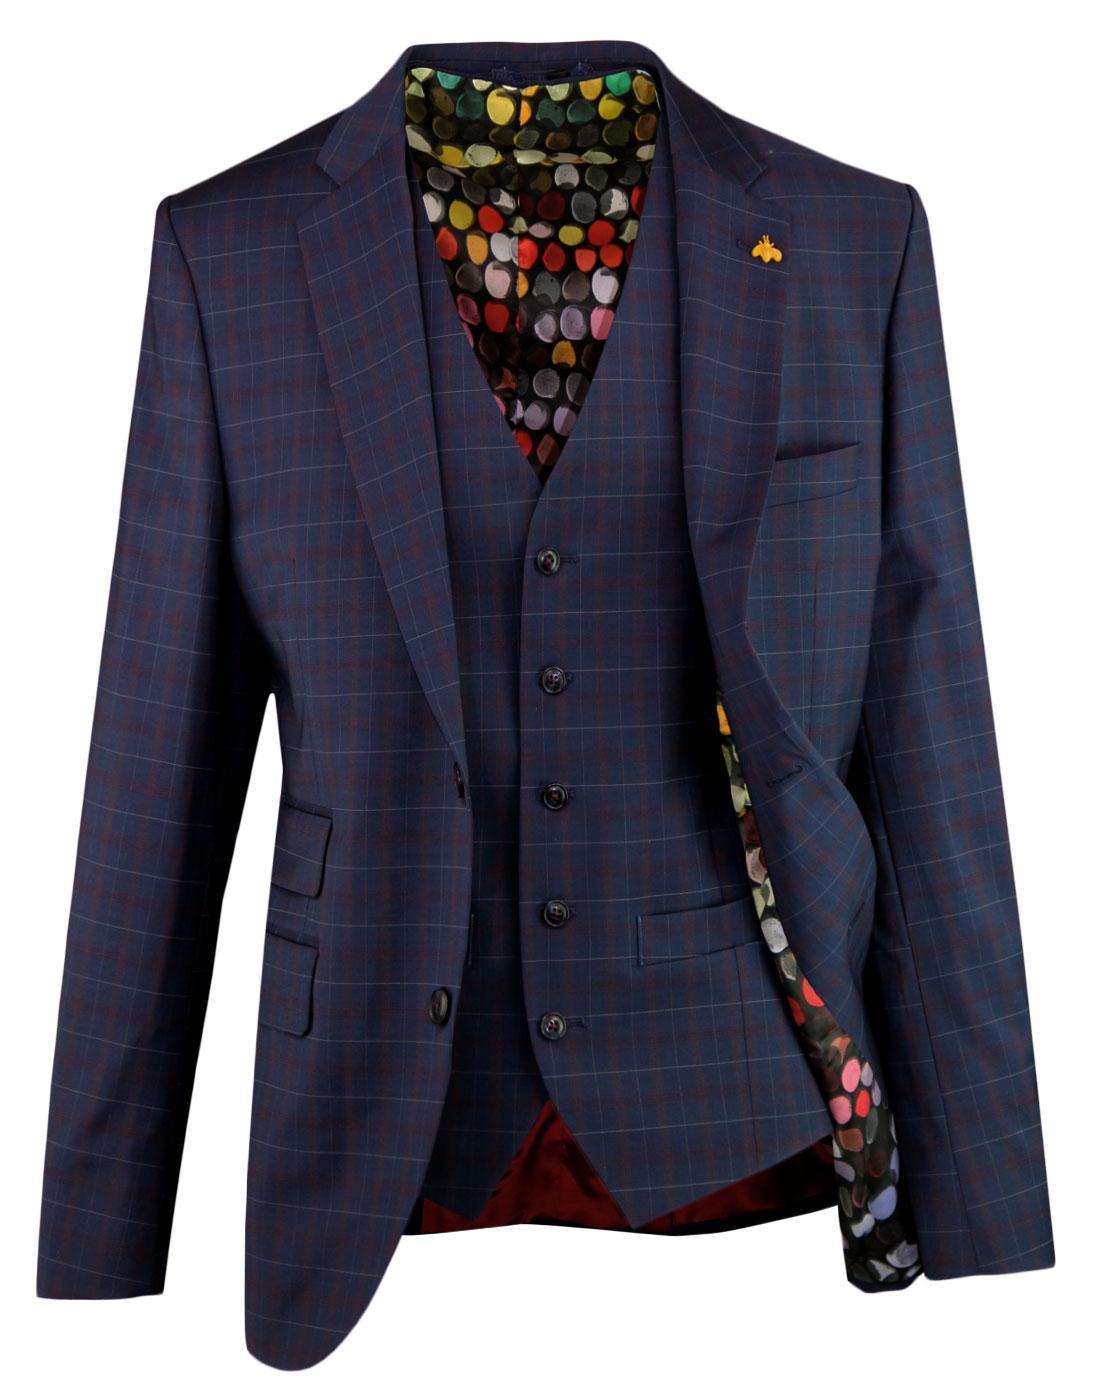 Marriott GIBSON LONDON Tartan Blazer & Waistcoat